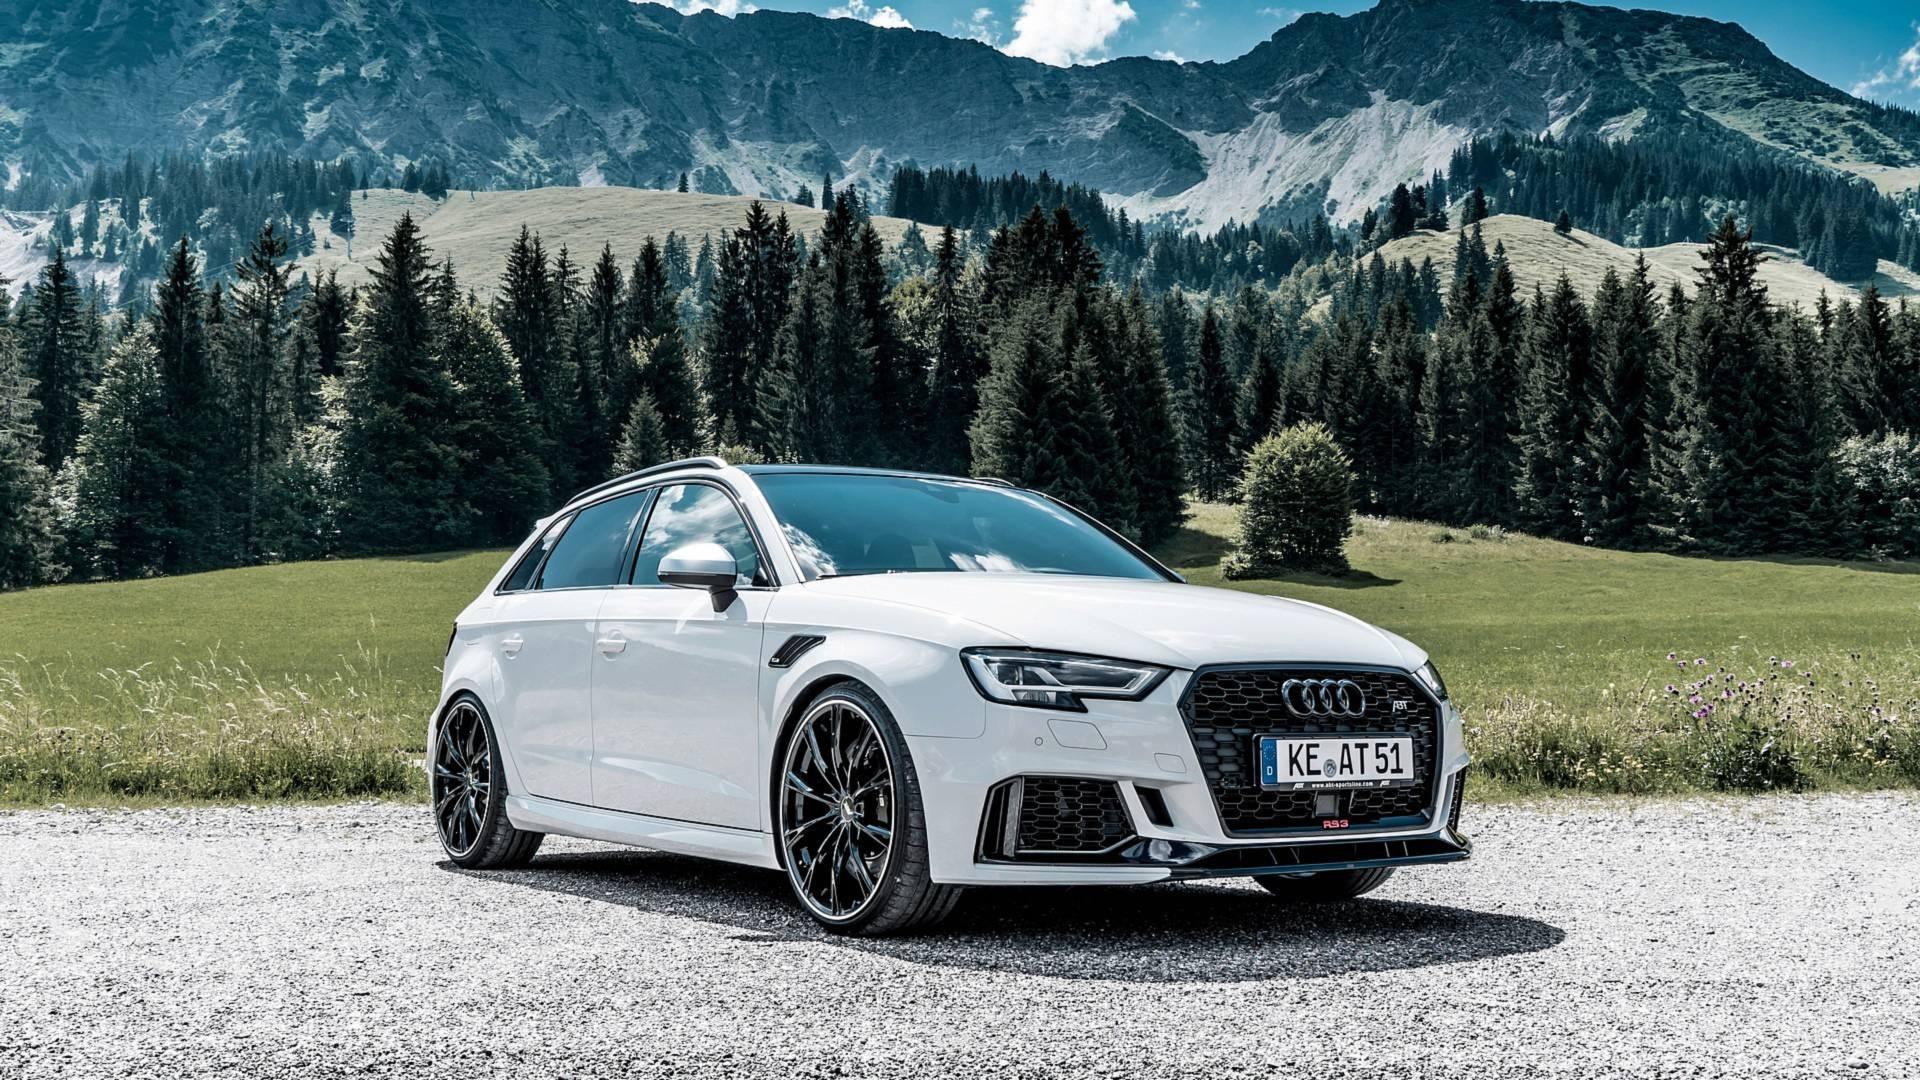 Тюнинг хэтчбека Audi RS3 Sportback от ABT